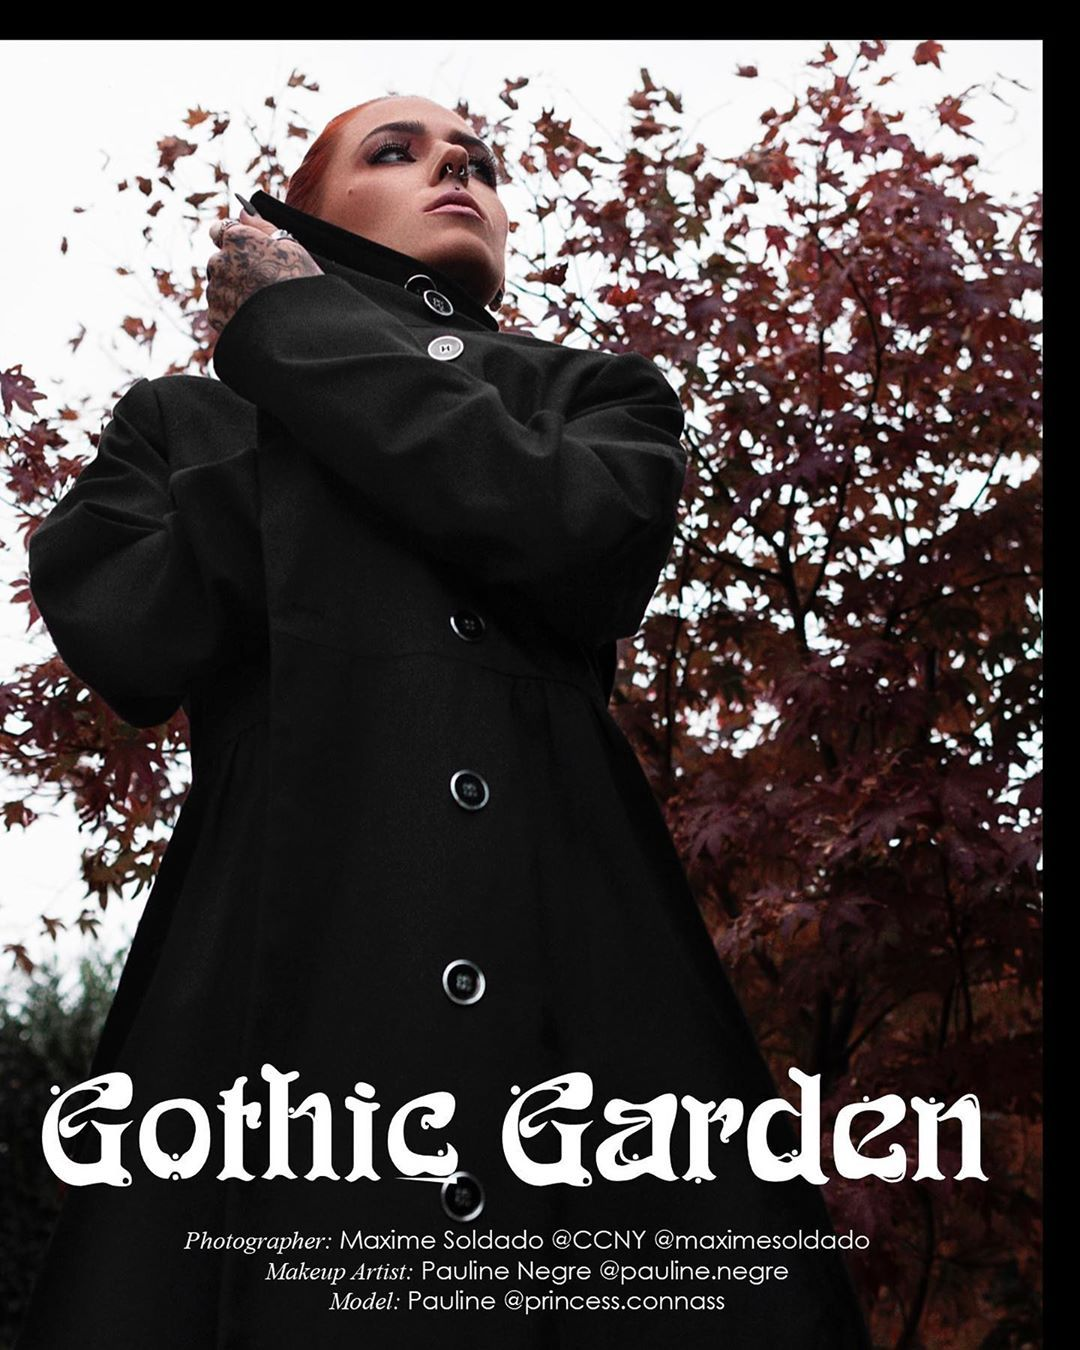 Gothic Garden for @likealionmagazine by @maximesoldado @gre @nnass @zara - @undizfamily